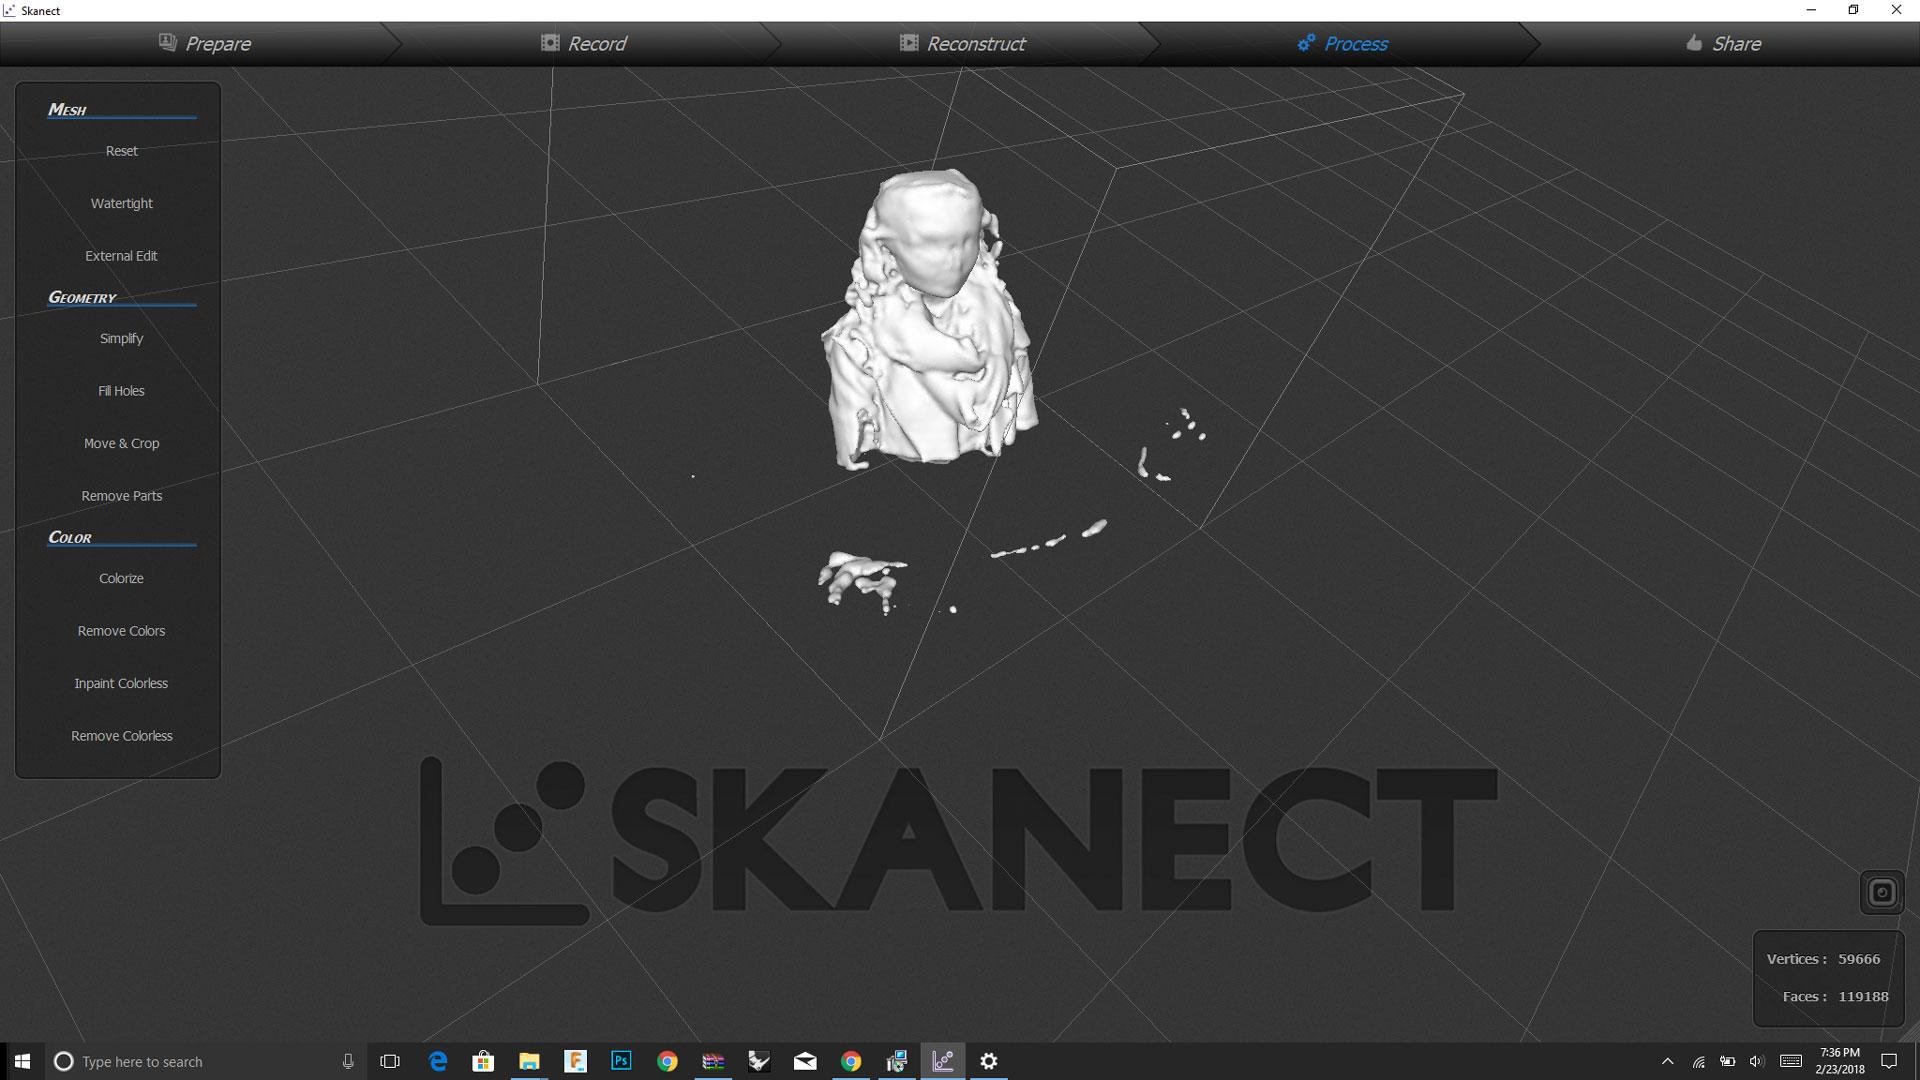 Skanect Kinect V2